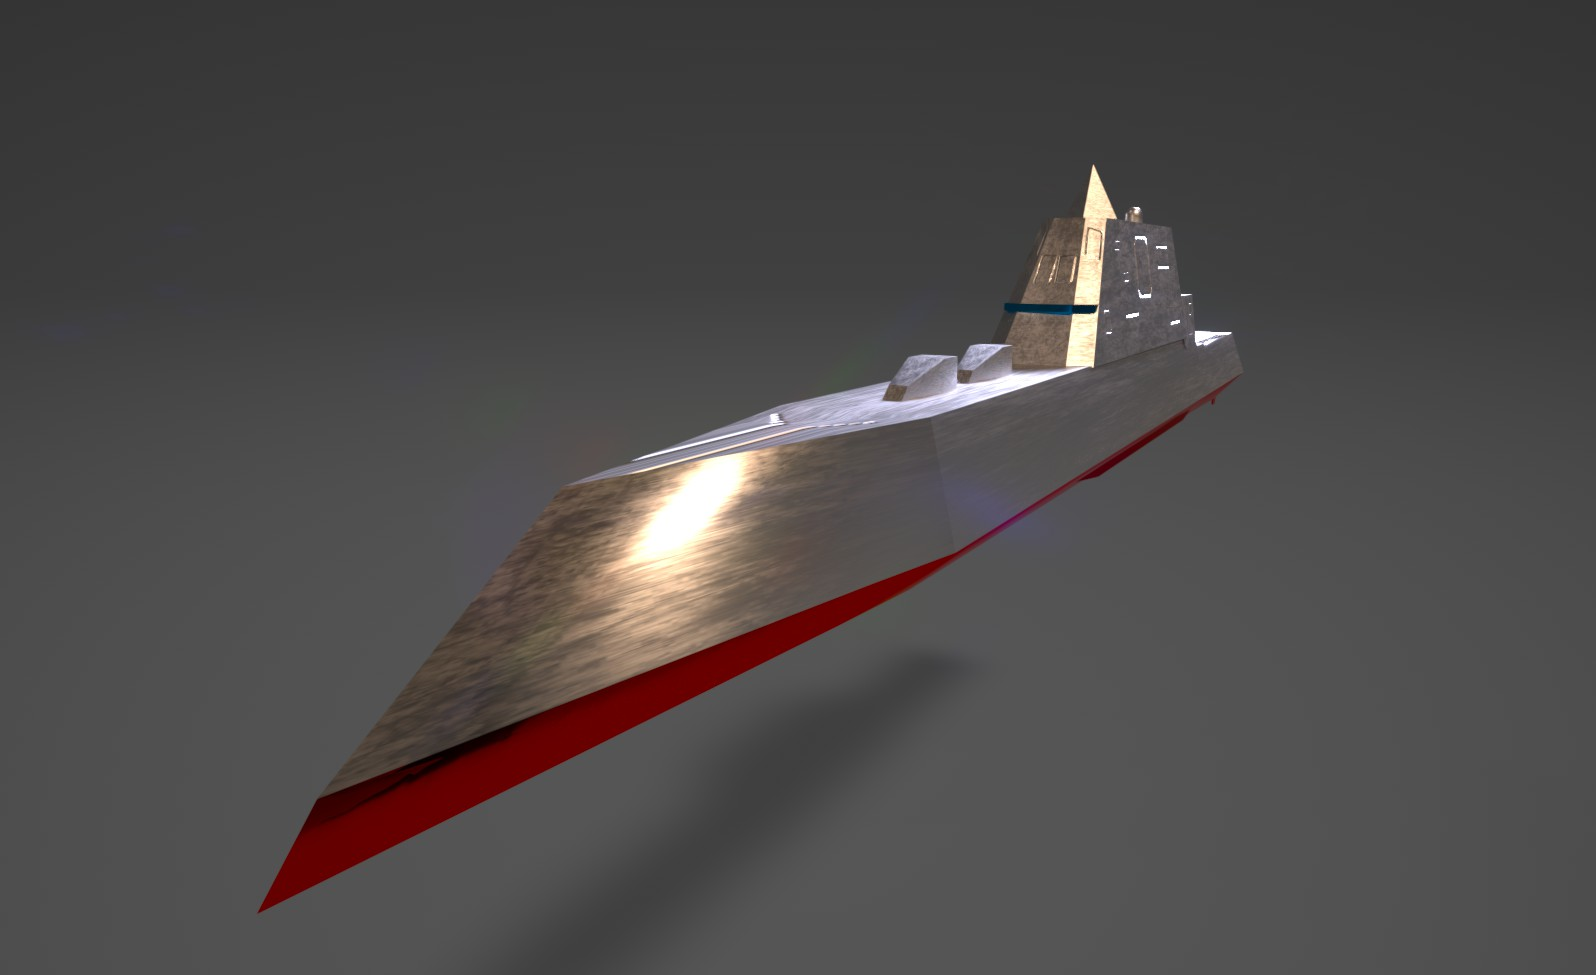 USS Zumwalt 2 by planetrix15